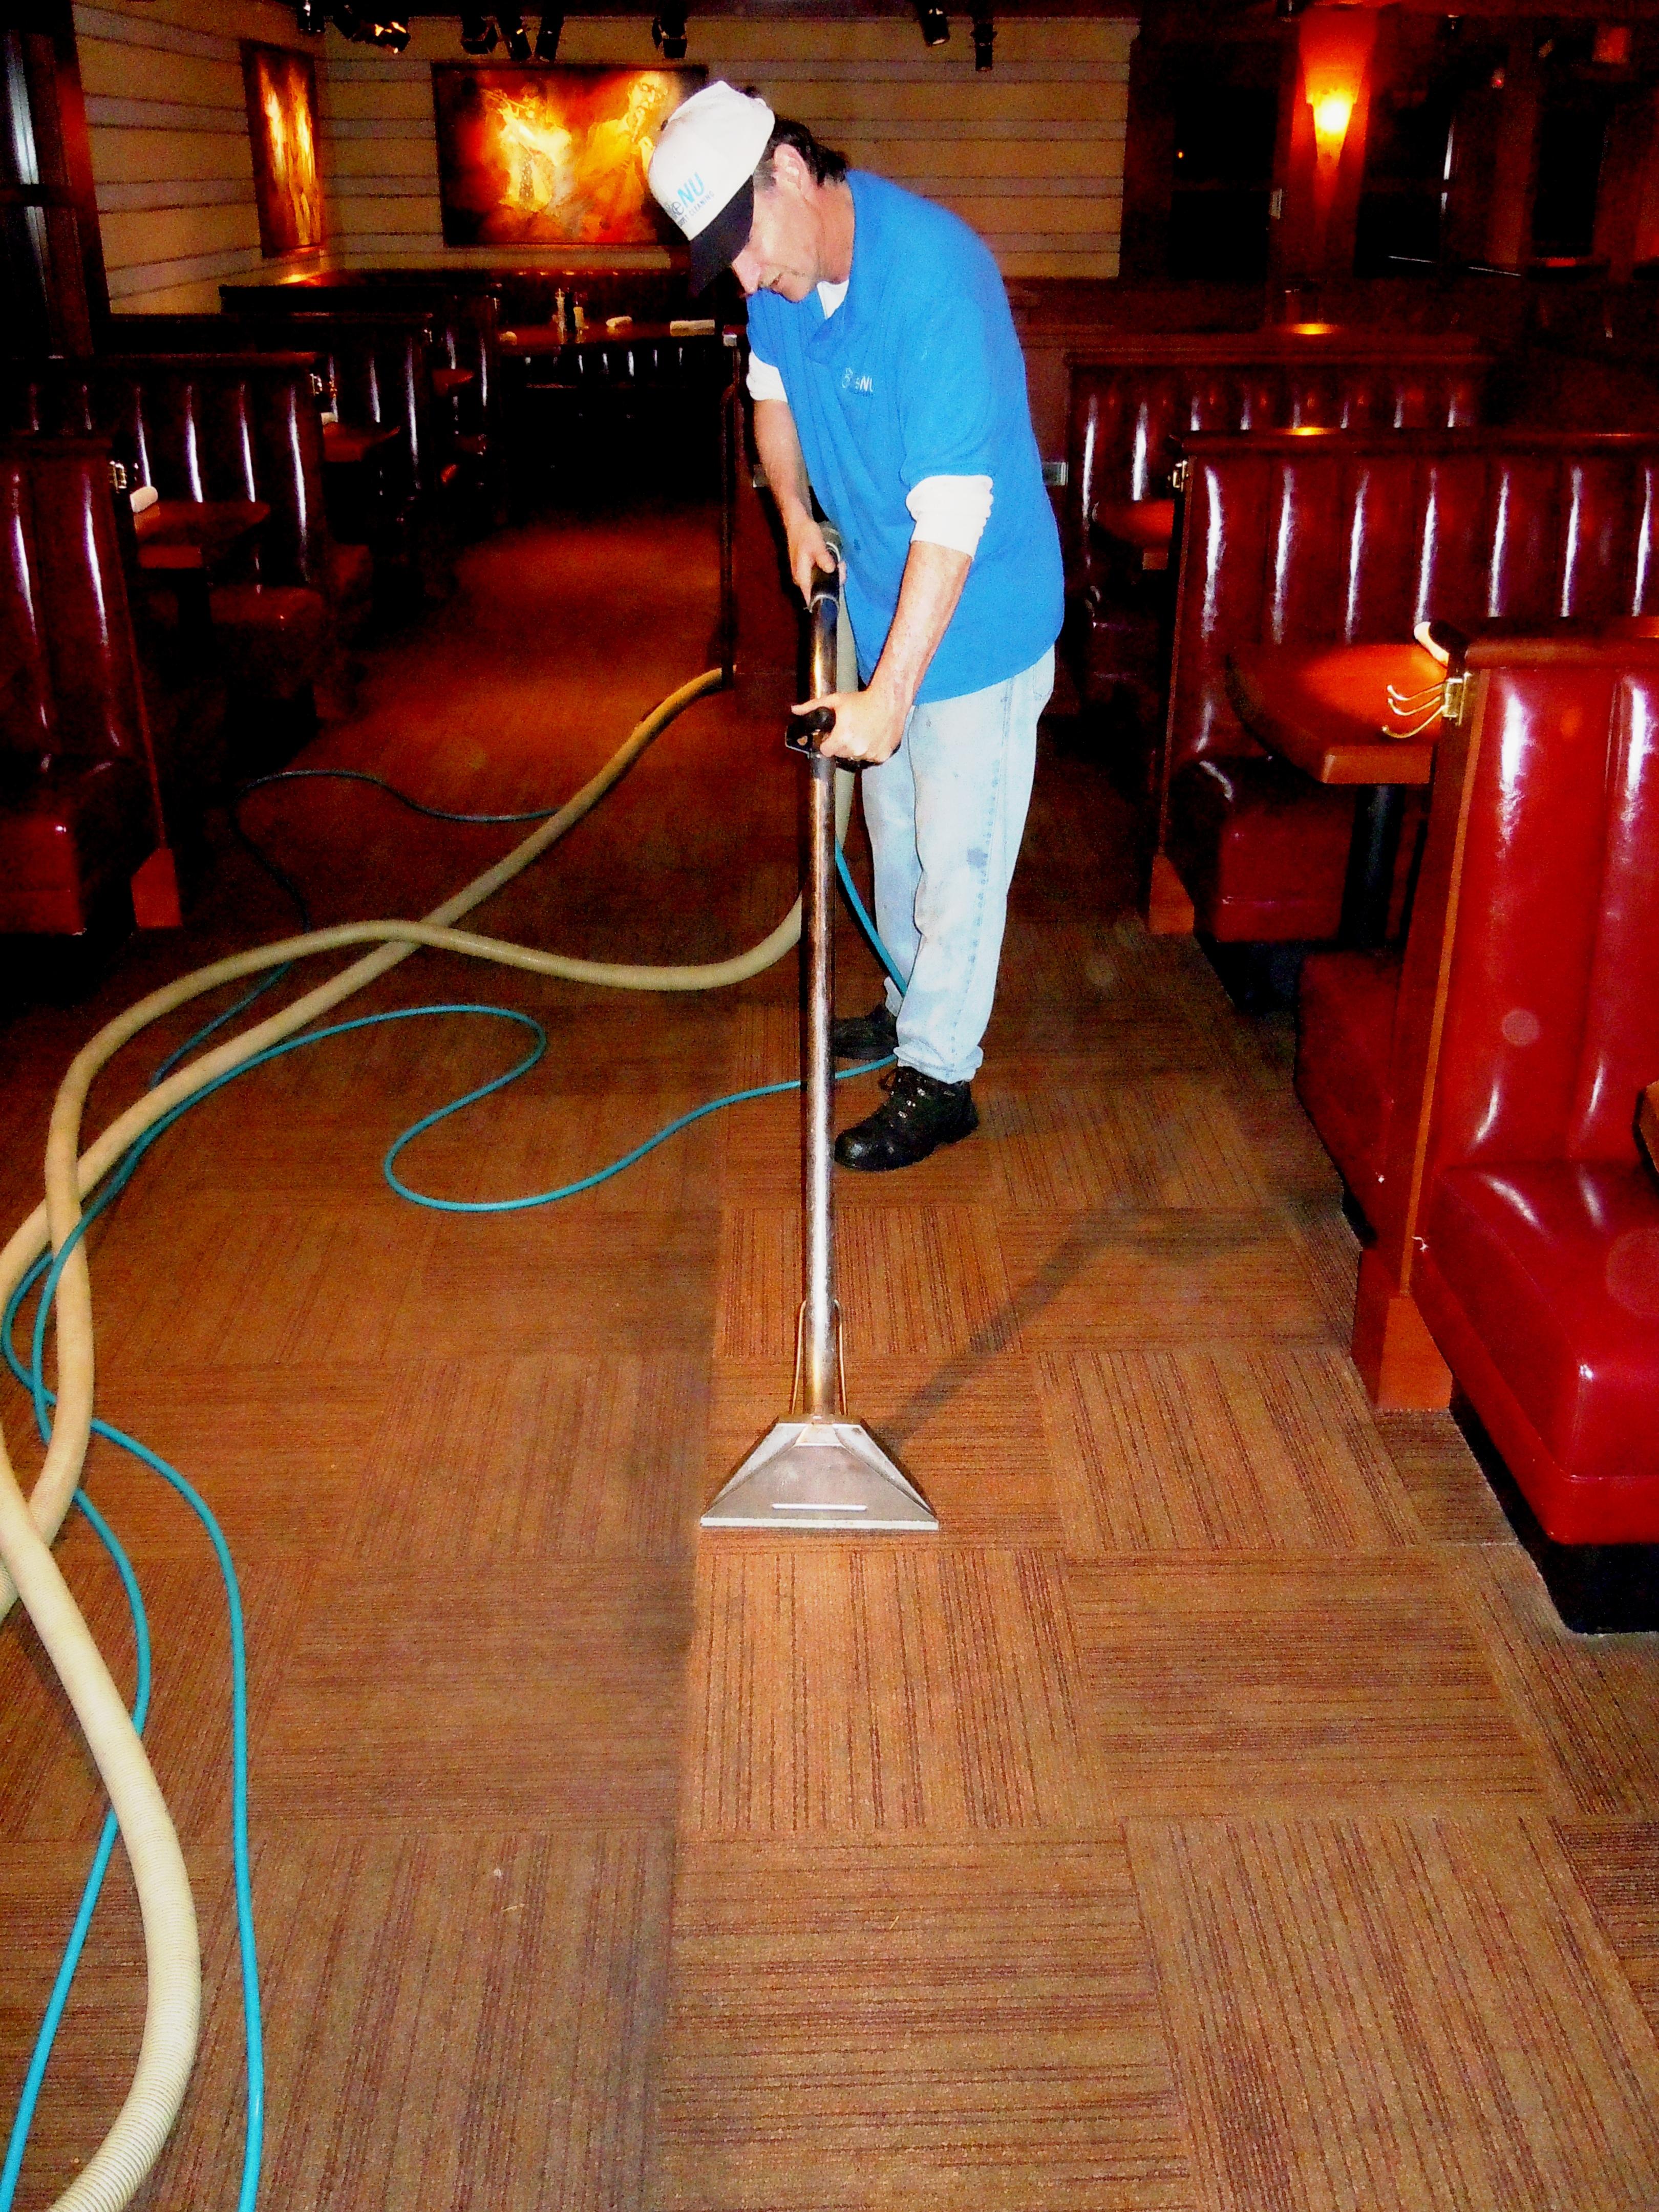 Likenu Carpet Tile Window Cleaning